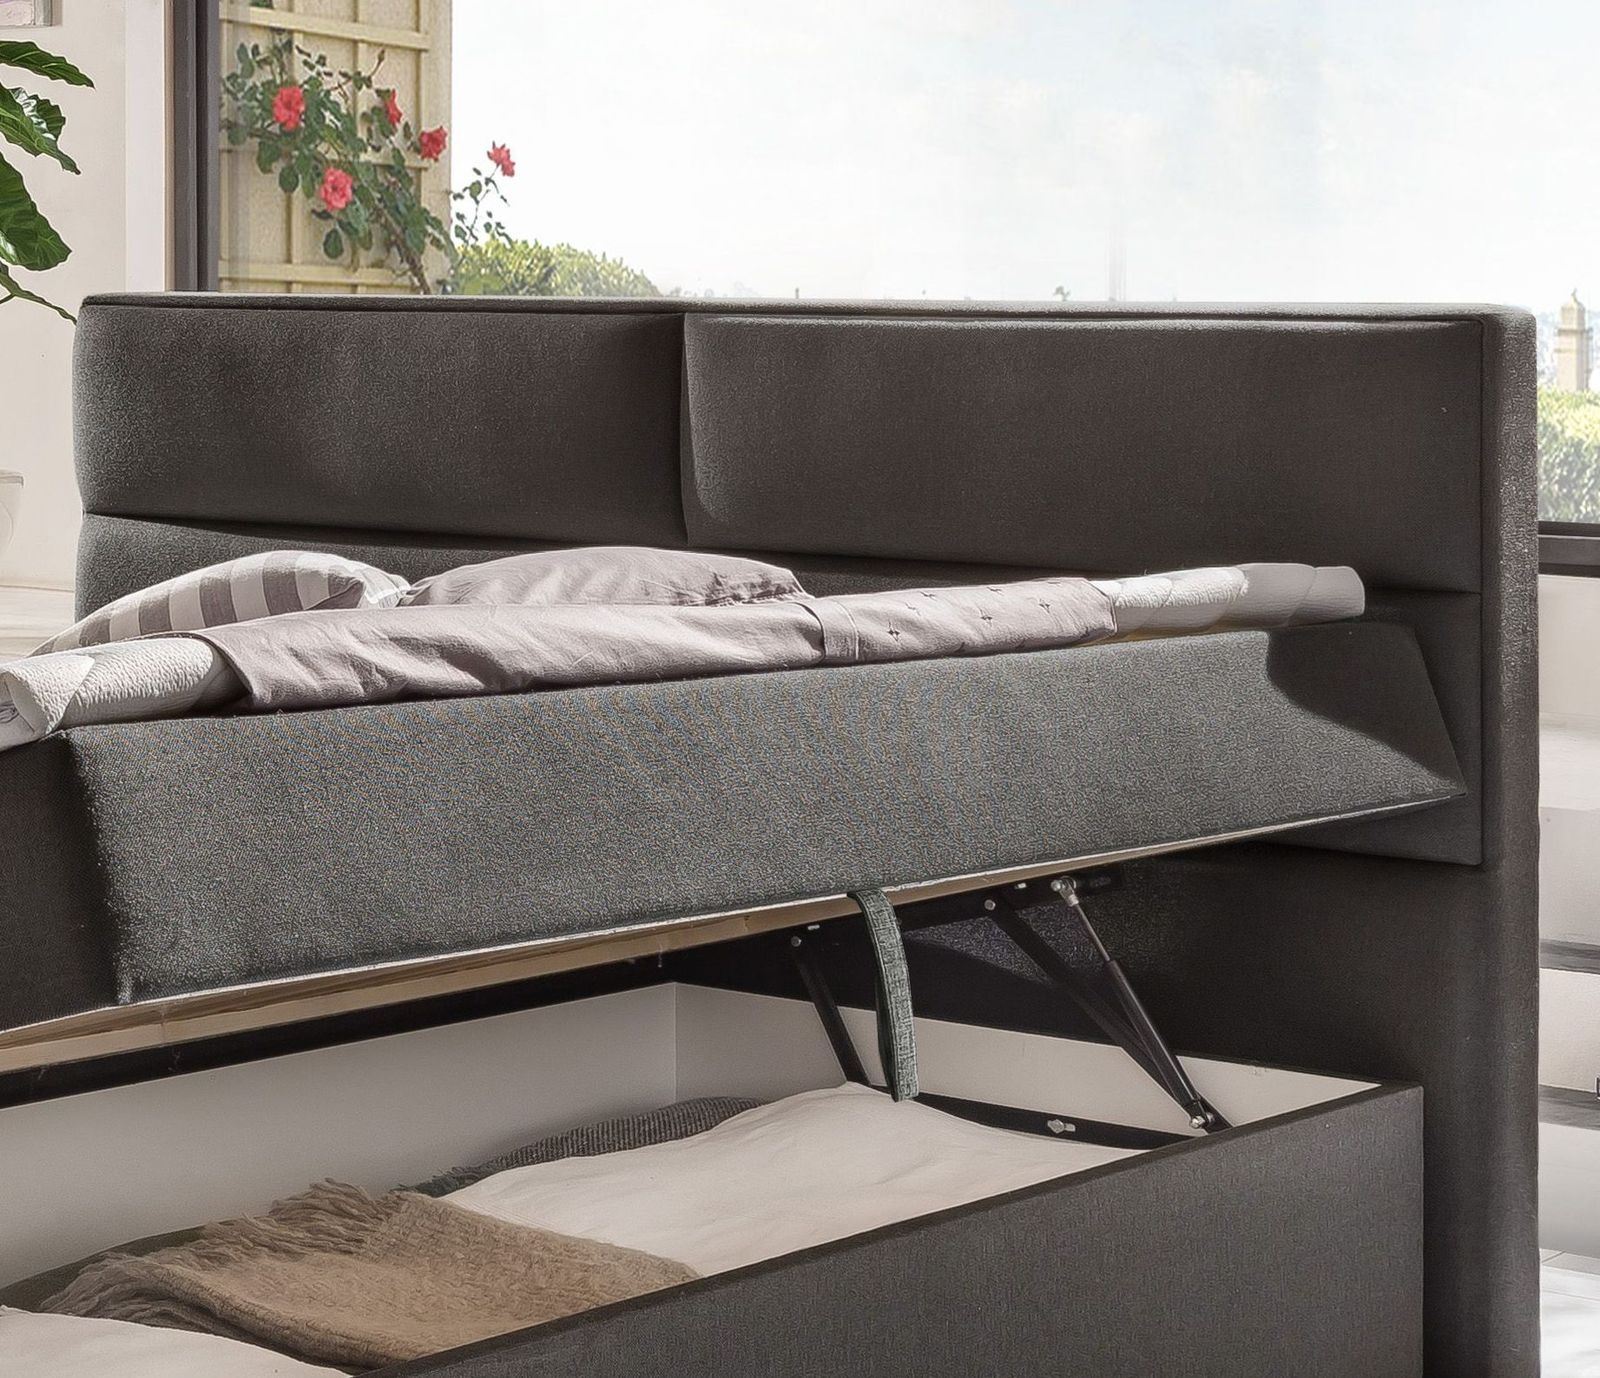 stoff boxbett 180x200 cm inklusive matratzen topper. Black Bedroom Furniture Sets. Home Design Ideas